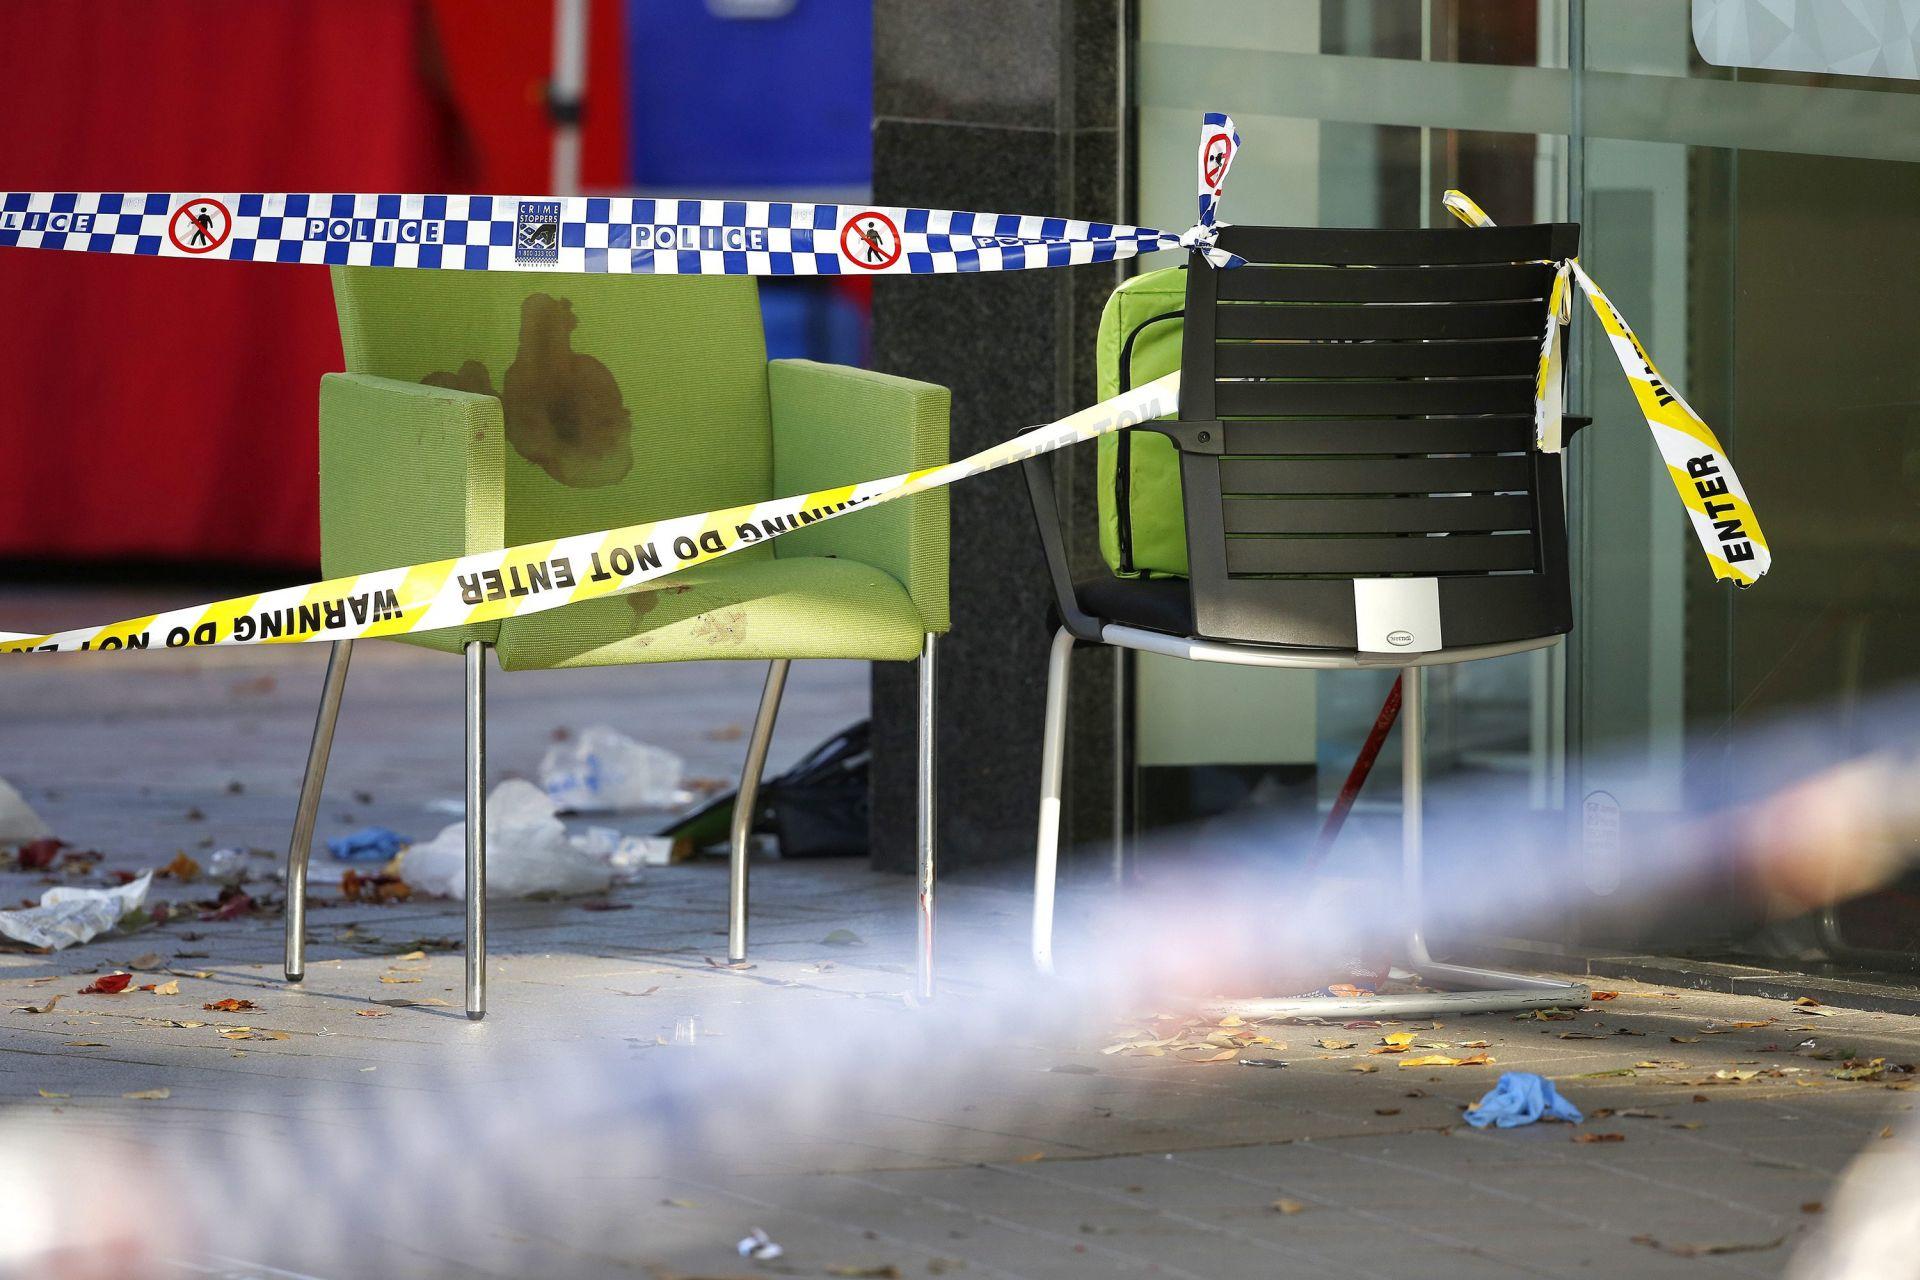 SUMNJA SE NA TERORIZAM: Britanka izbodena na smrt u napadu na hostel u Australiji